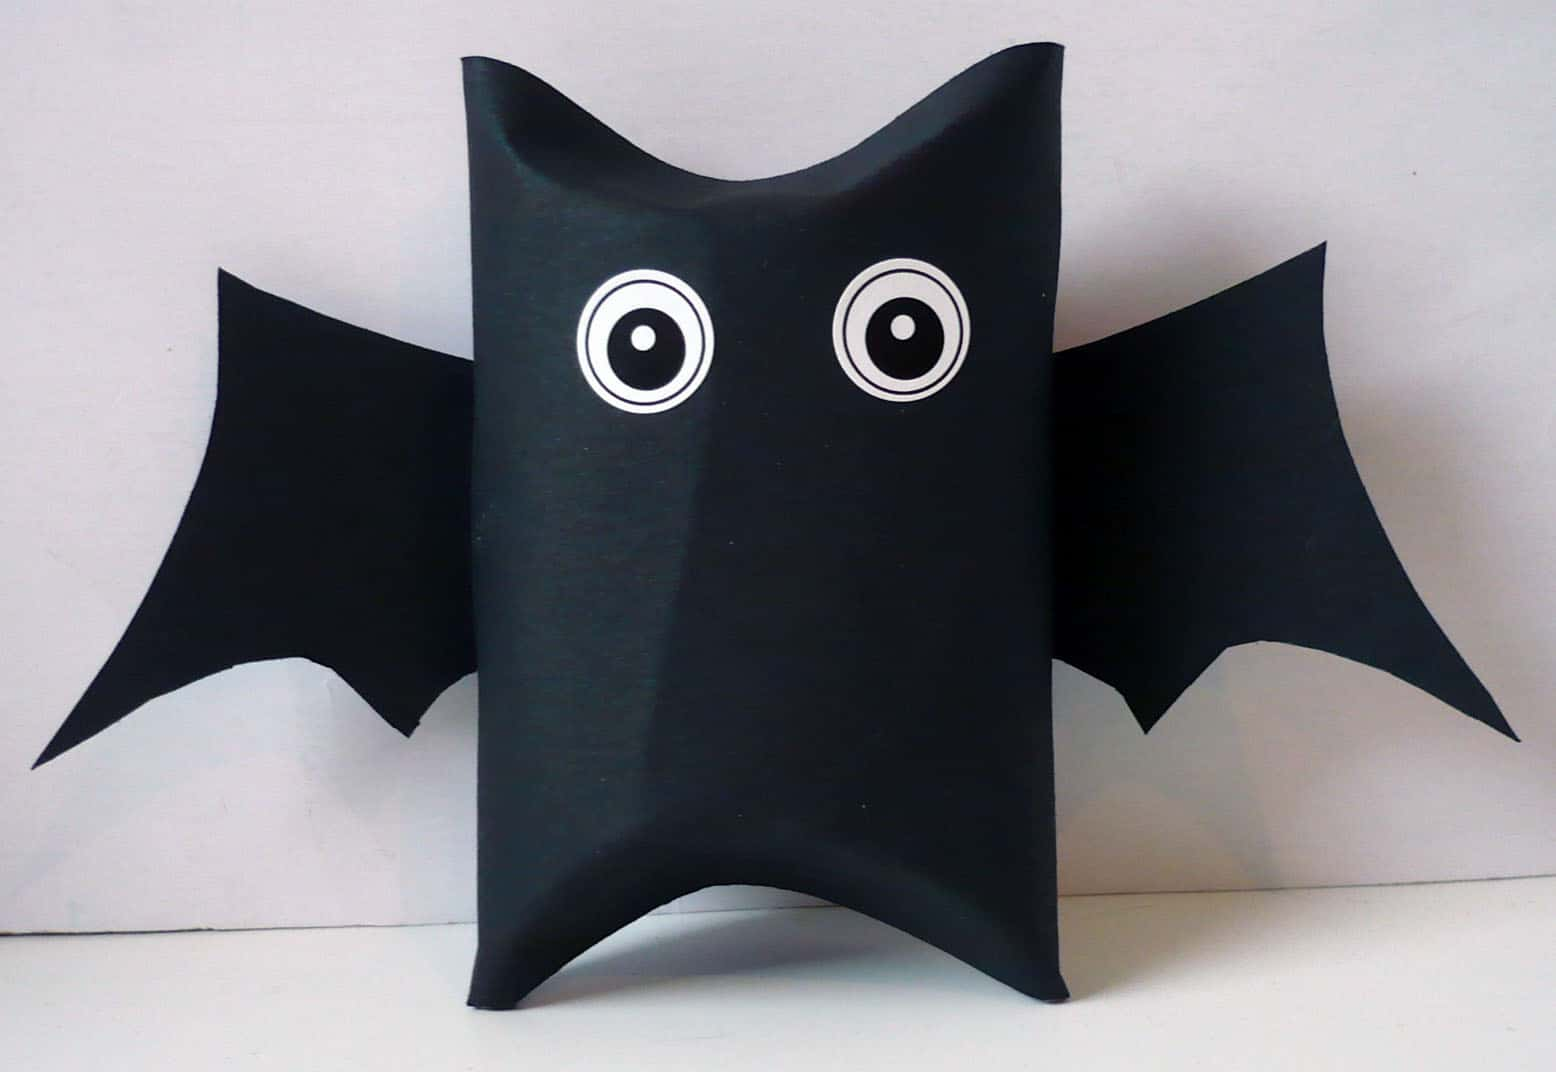 boites bonbons pour halloween emballage cadeau. Black Bedroom Furniture Sets. Home Design Ideas